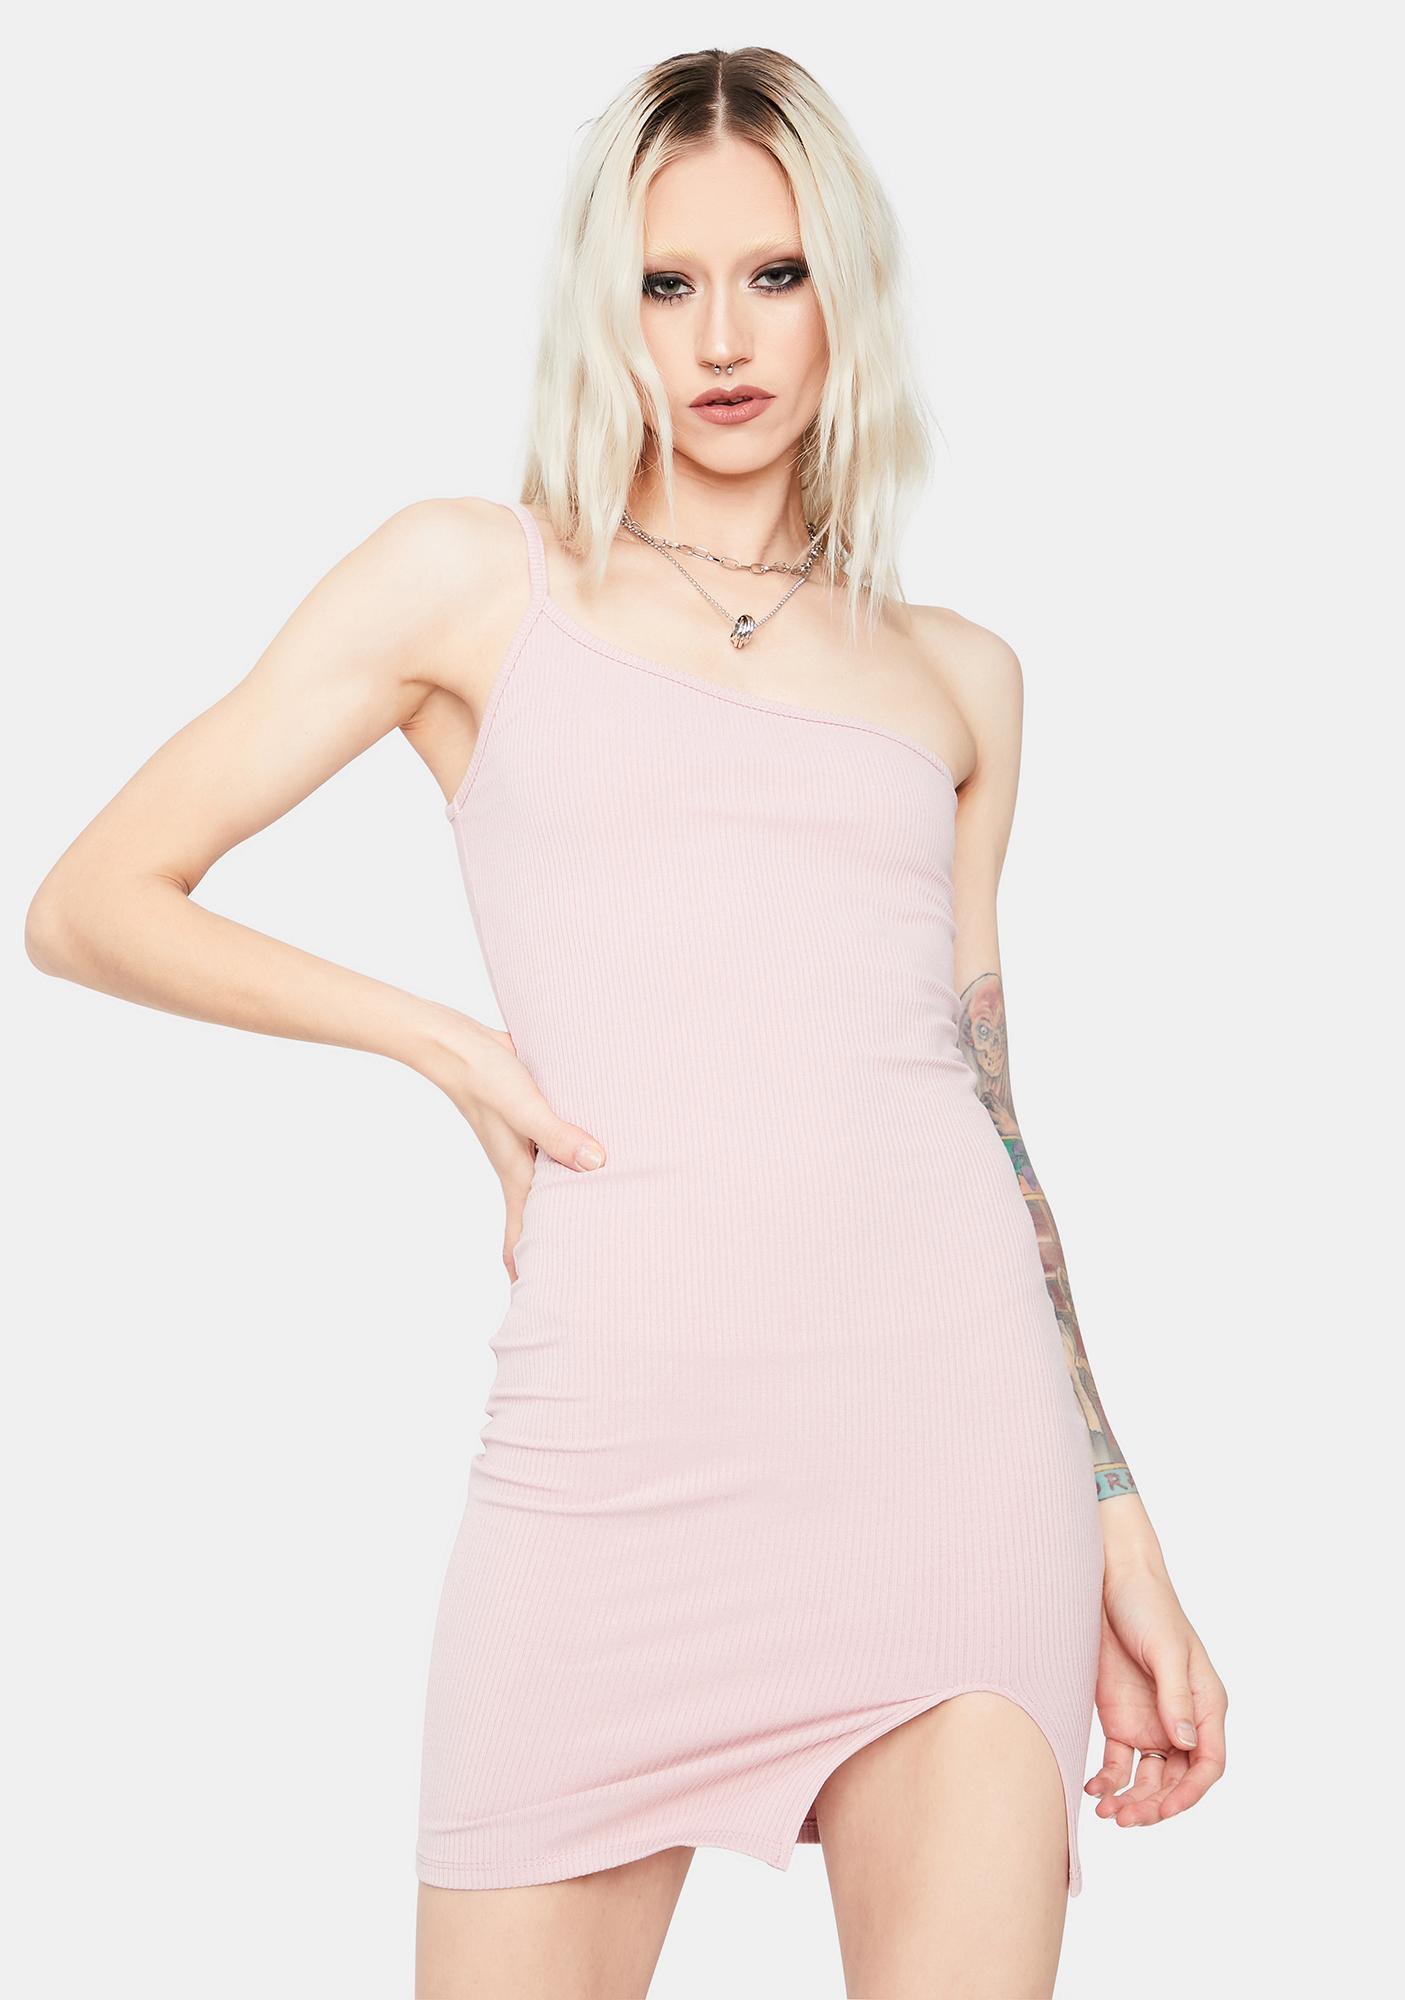 Blush Always Crushin' Bodycon Mini Dress